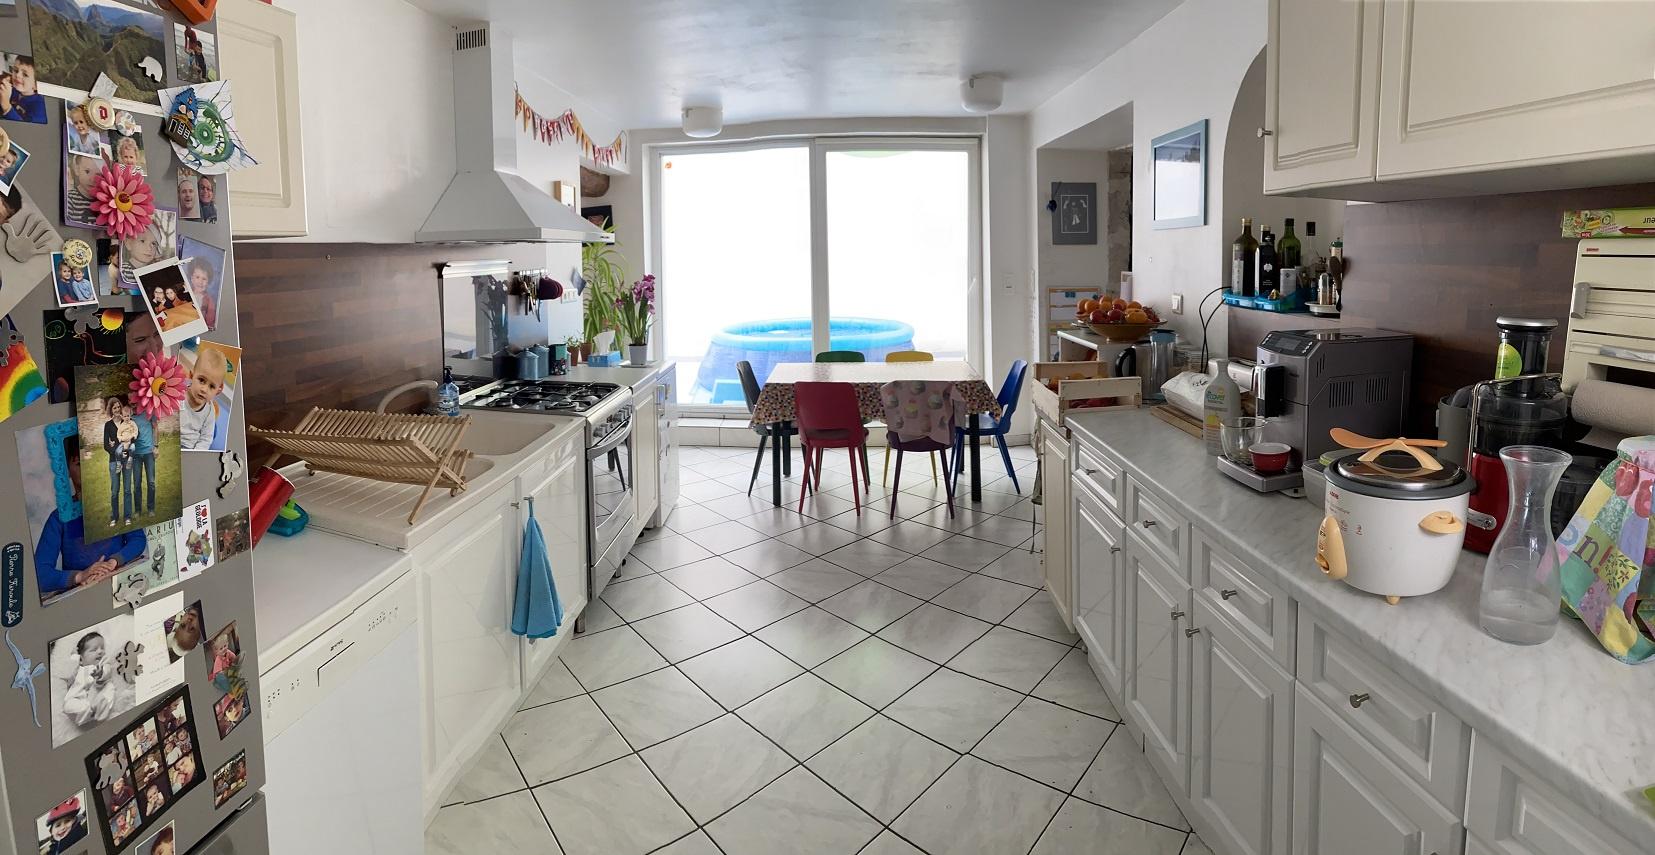 Cuisine aménagée de 17 m²